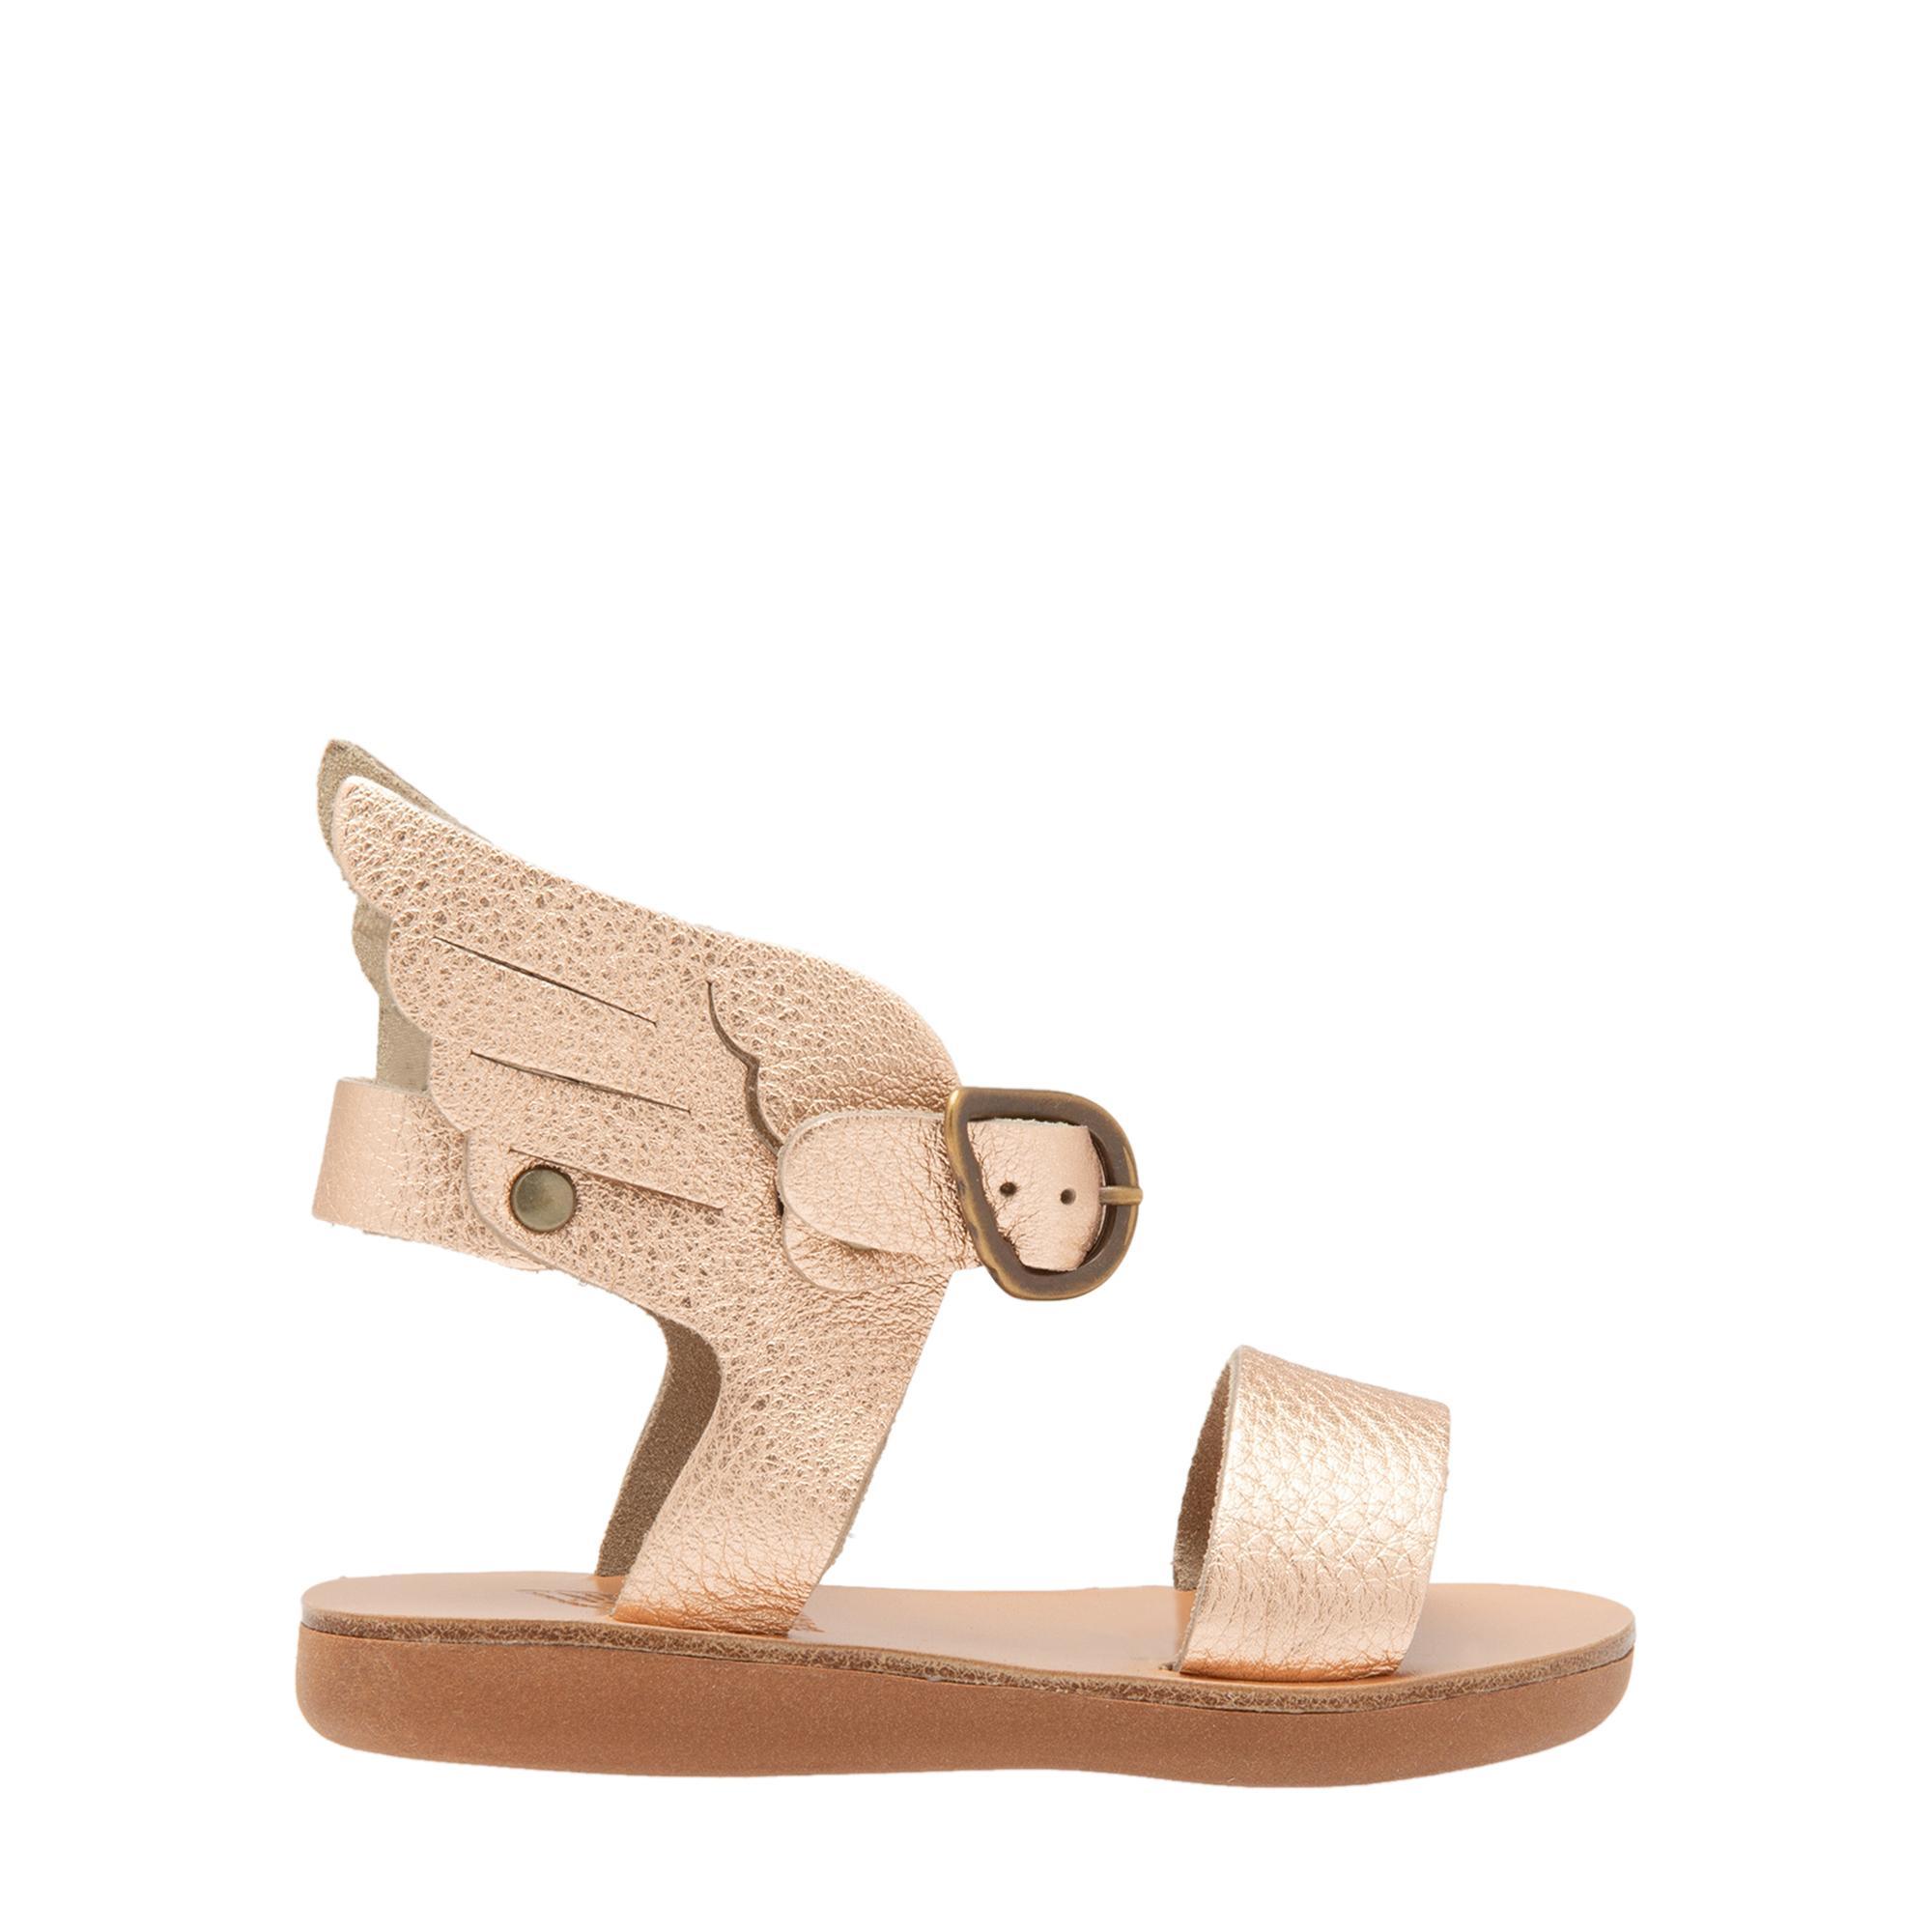 Little Ikaria sandals